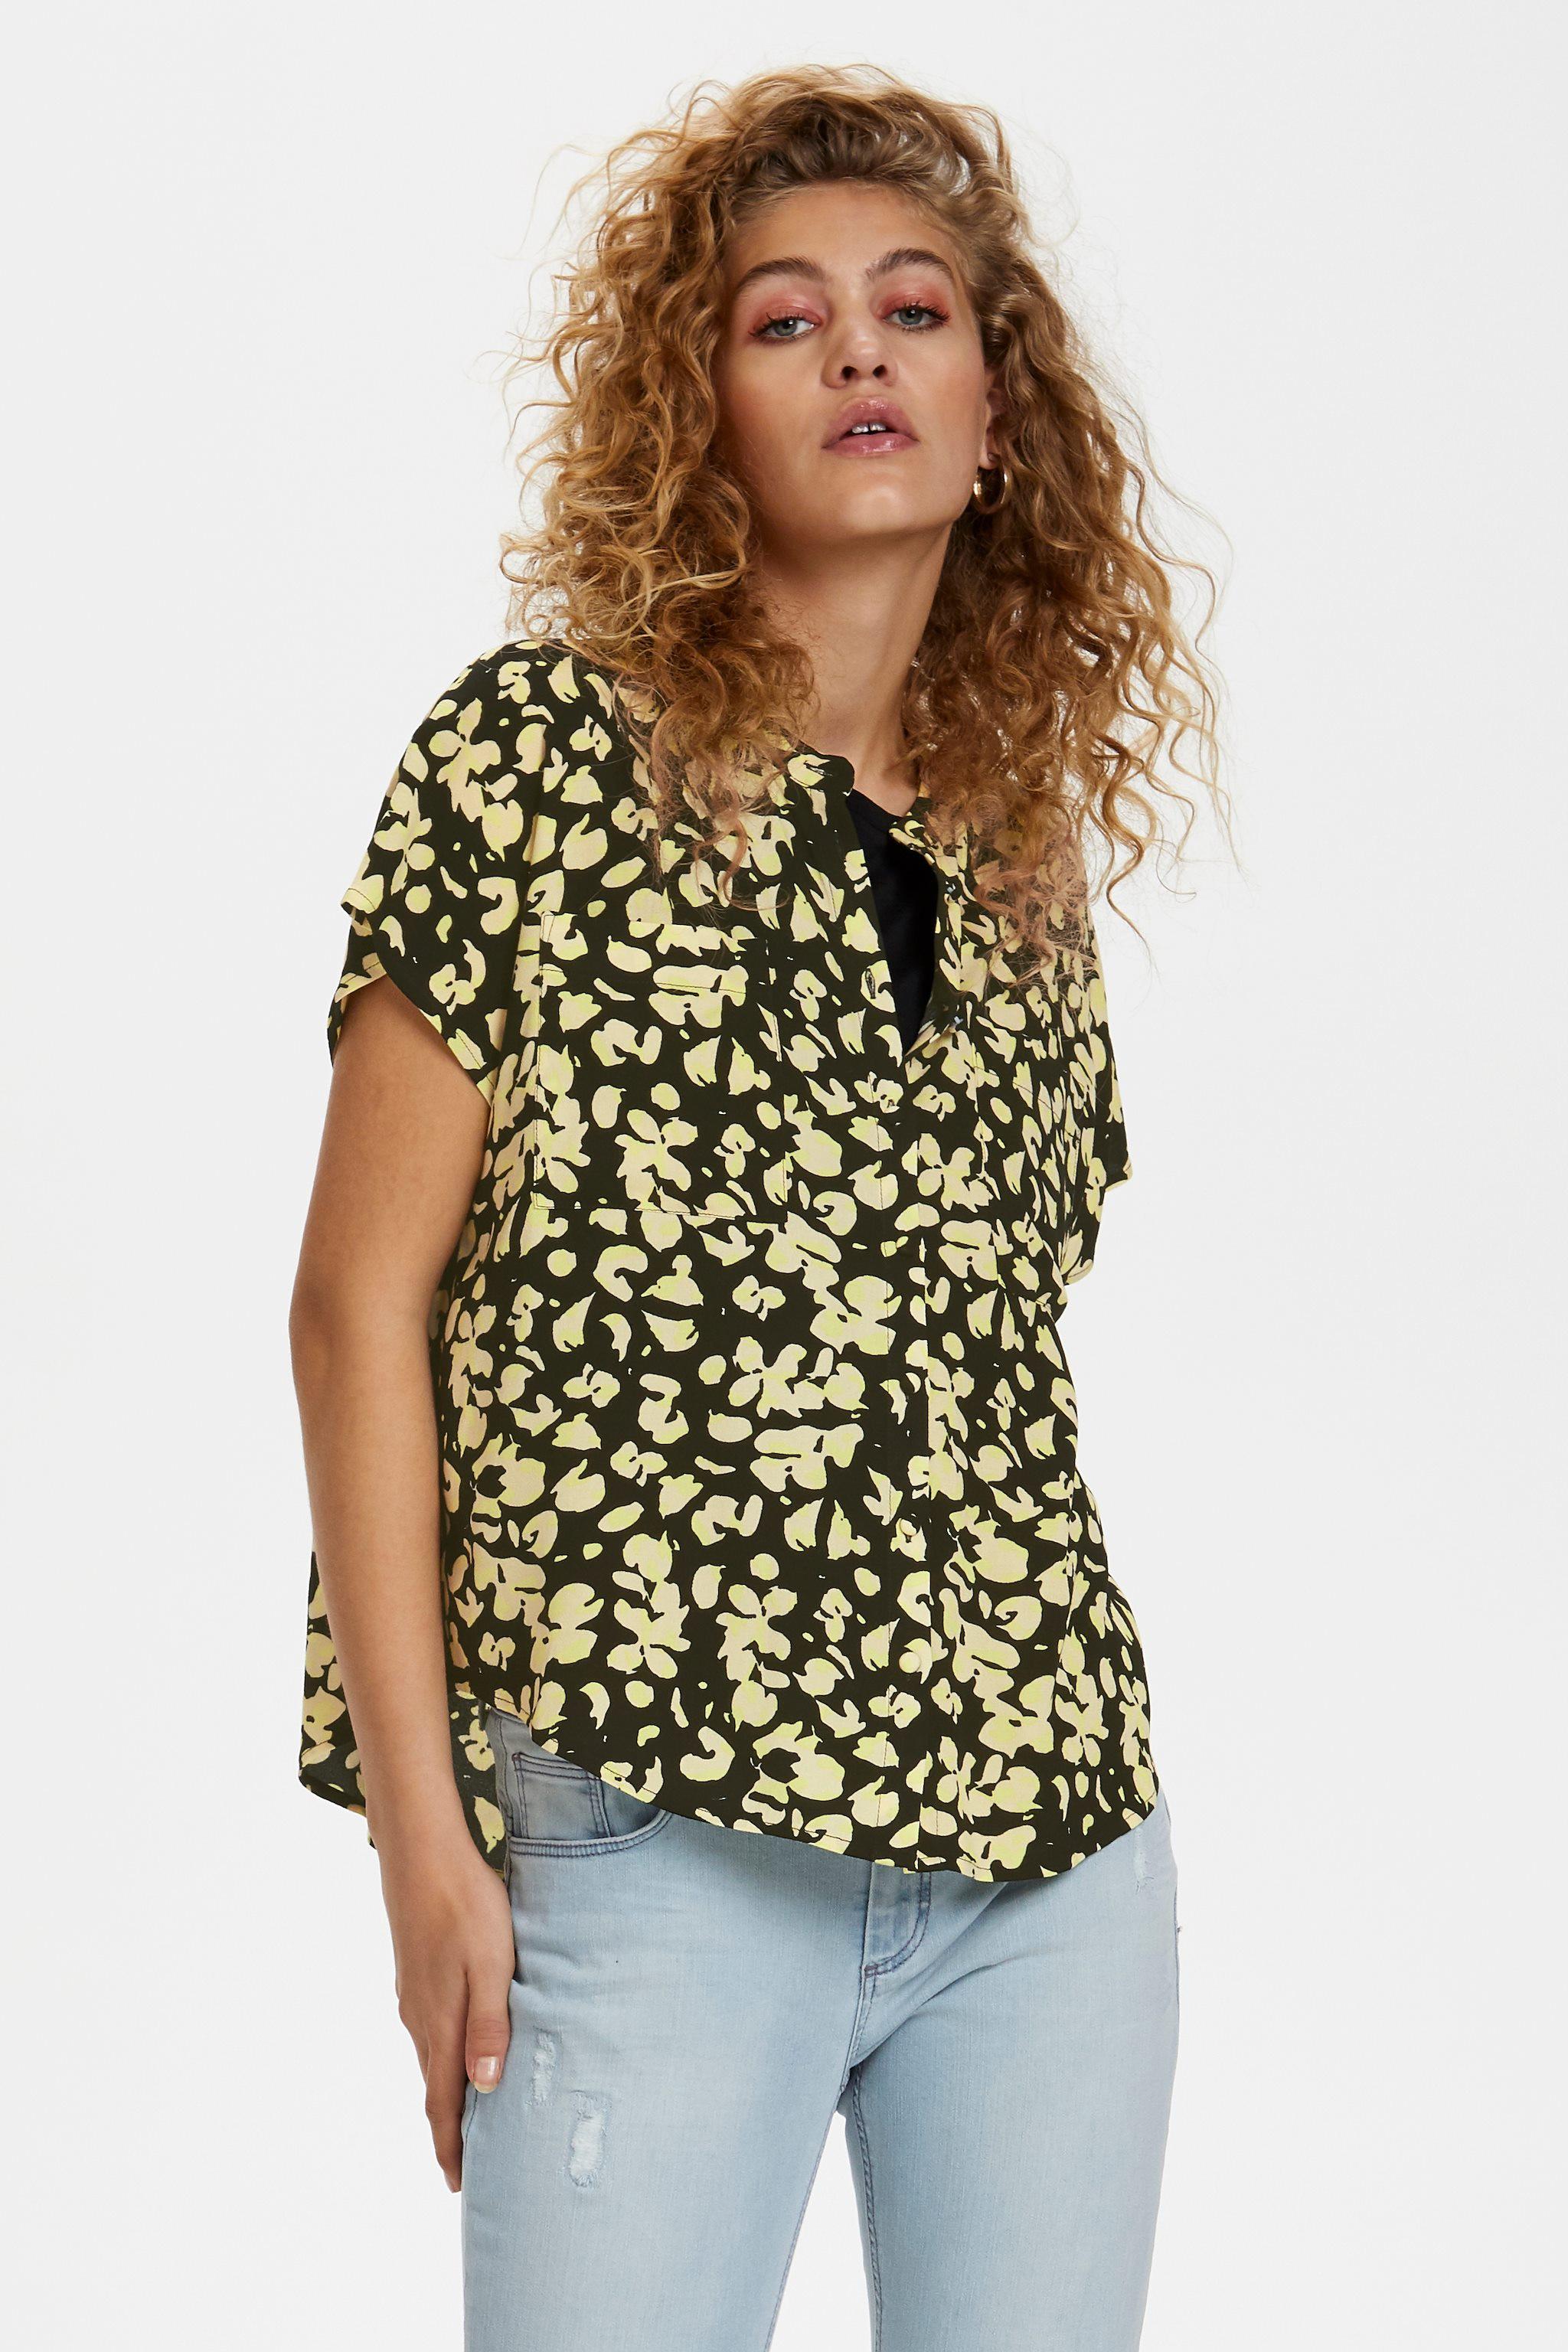 Denim Hunter sort bluse med gult.